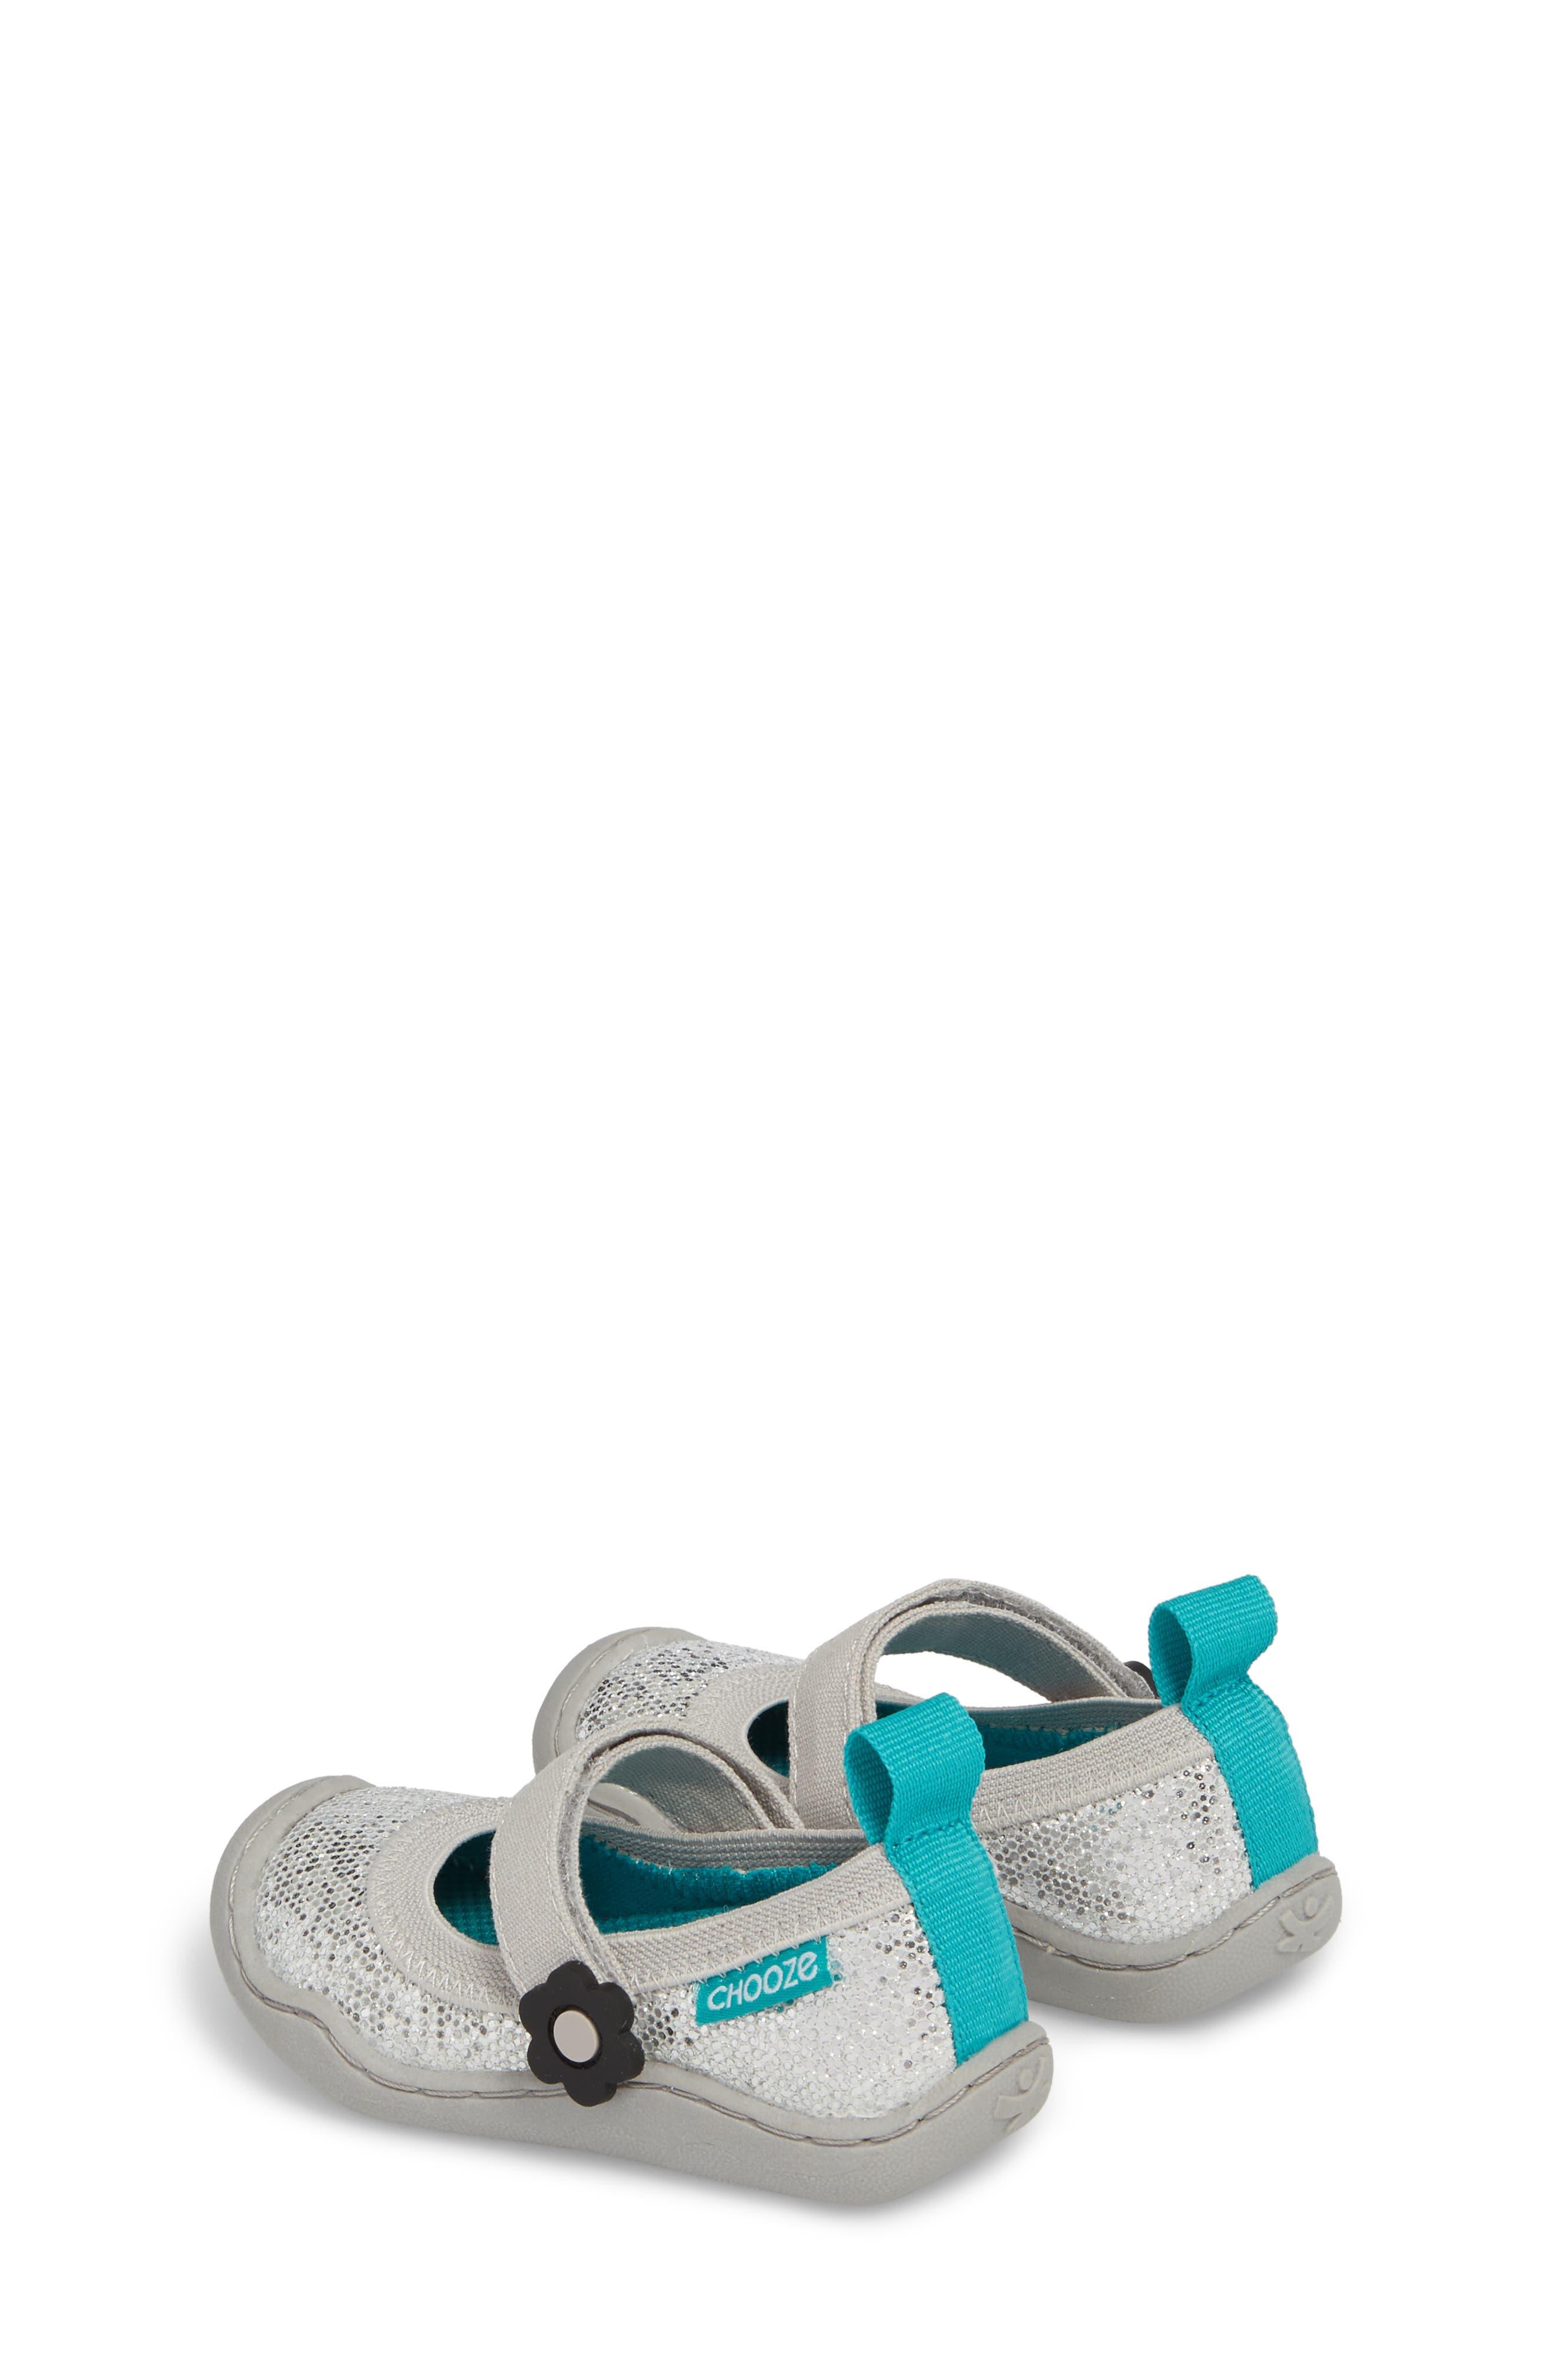 CHOOZE, Steady Shimmer Mary Jane Sneaker, Alternate thumbnail 3, color, GLOW PLATINUM